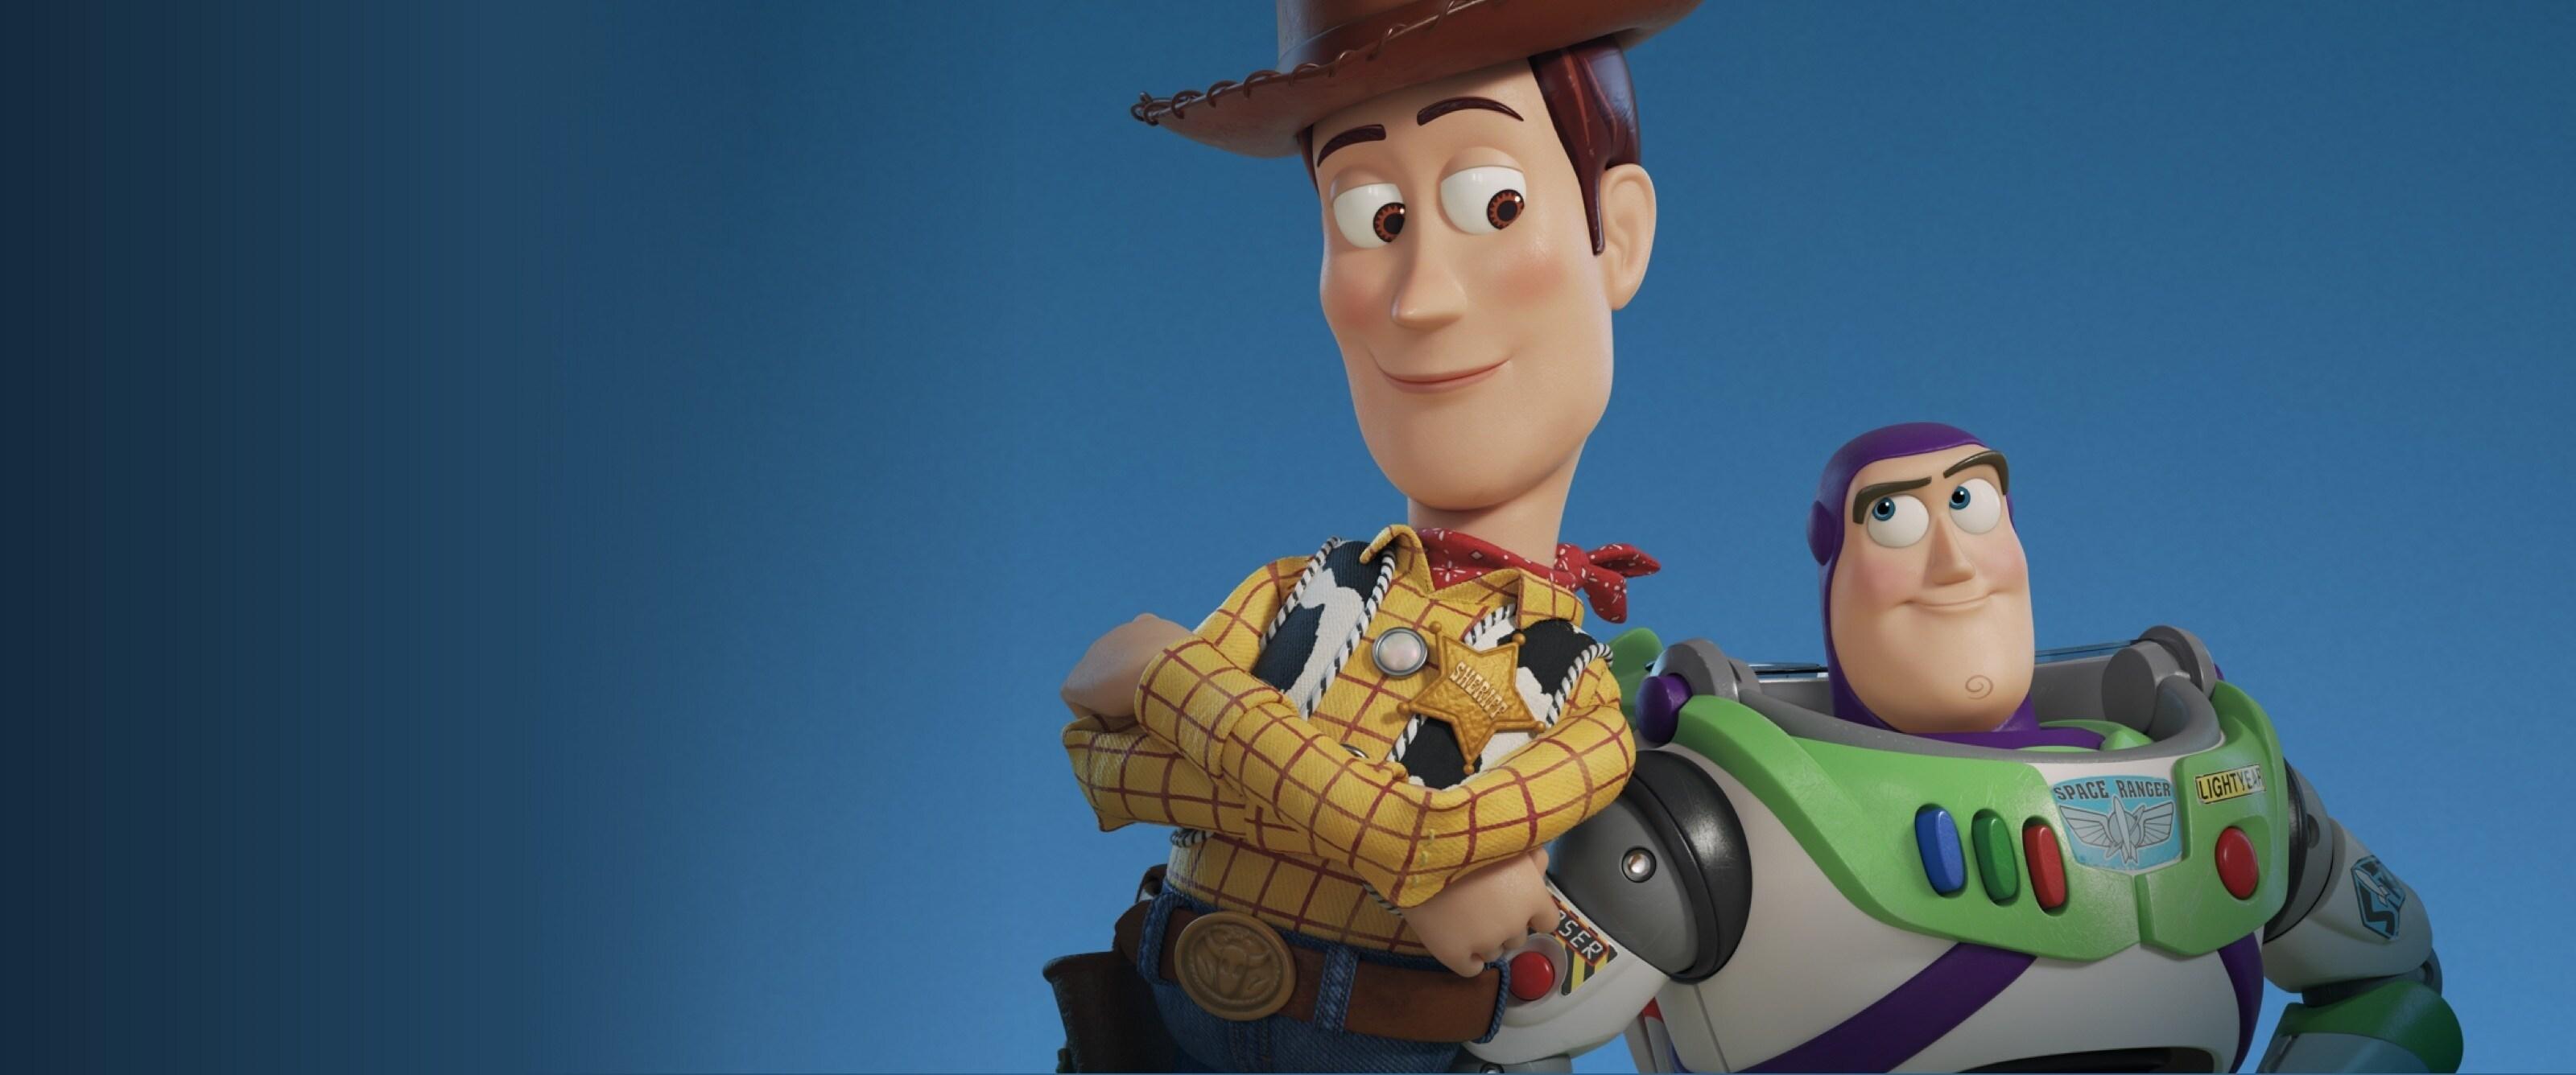 Explore the Disney•Pixar Collection at shopDisney